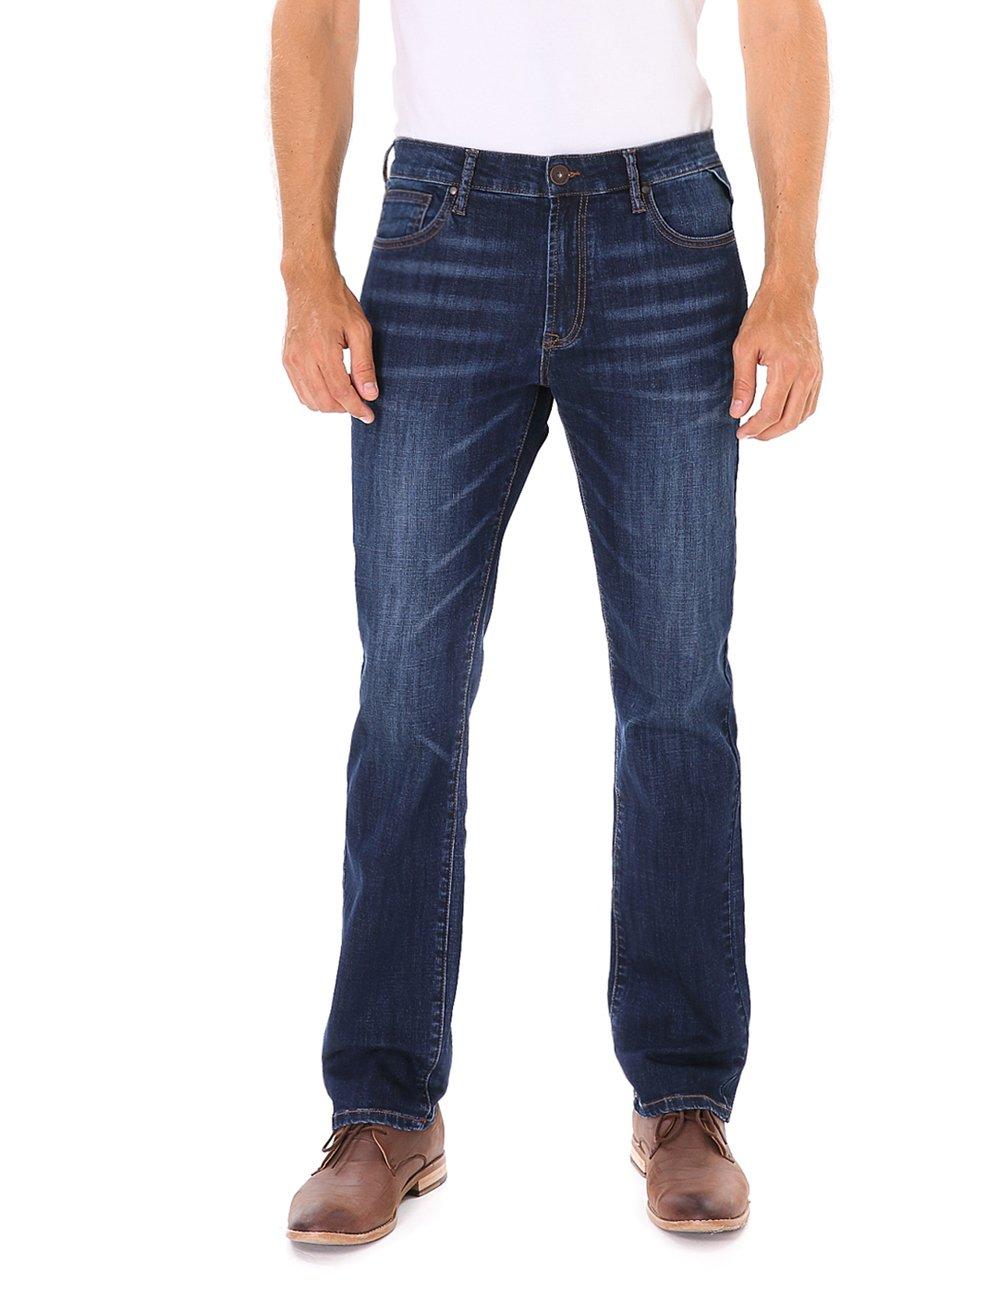 Indigo alpha Men's Stretch Regular-Fit Straight Leg Jean Summer,Blue,40W x 32L